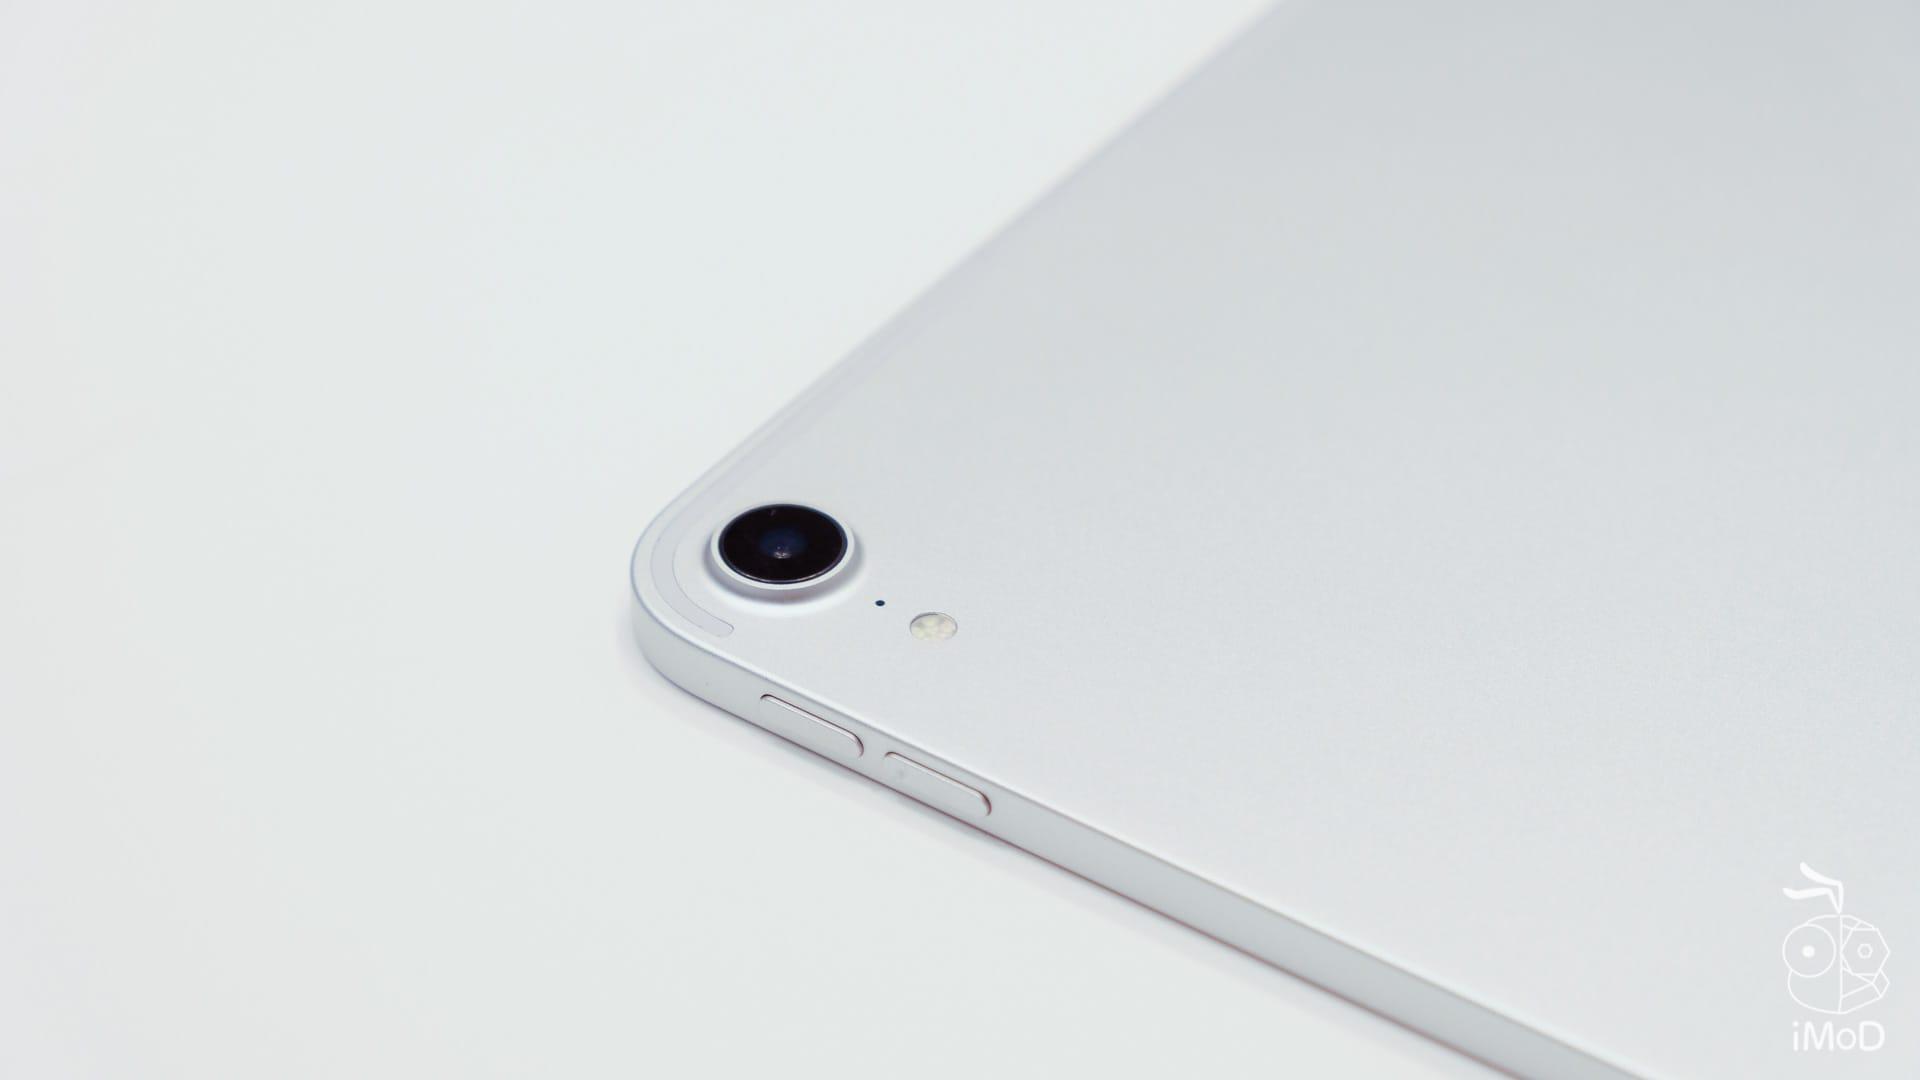 Ipad Pro Macbook Air 2018 Studio7 2443